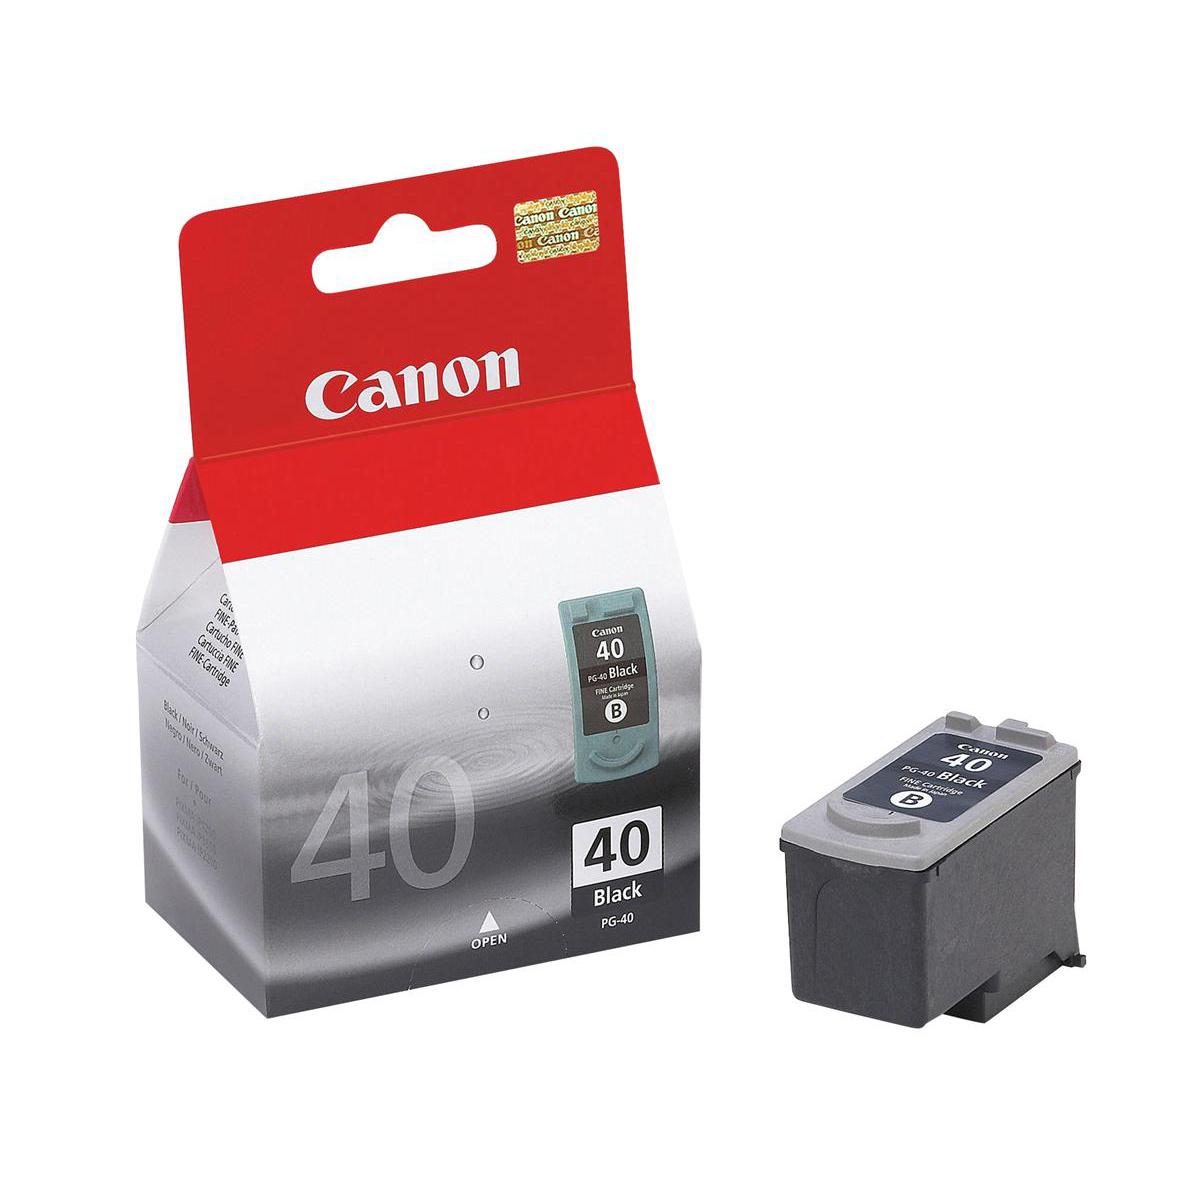 Canon PG-40 Inkjet Cartridge Page Life 329pp Black Ref 0615B001